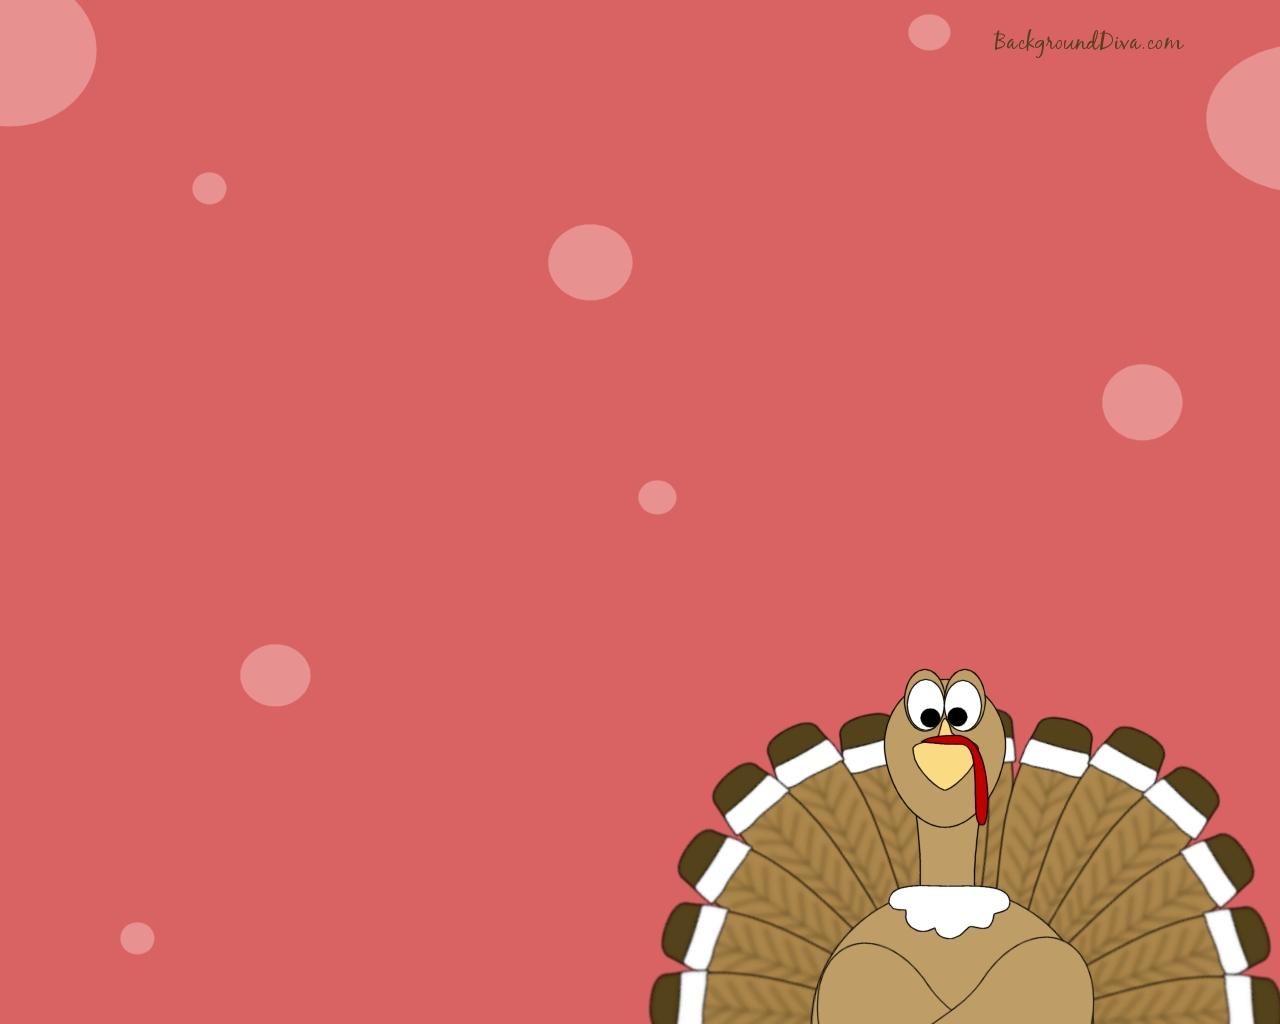 Funny Thanksgiving Wallpaper Cute thanksgiving turkey 1280x1024